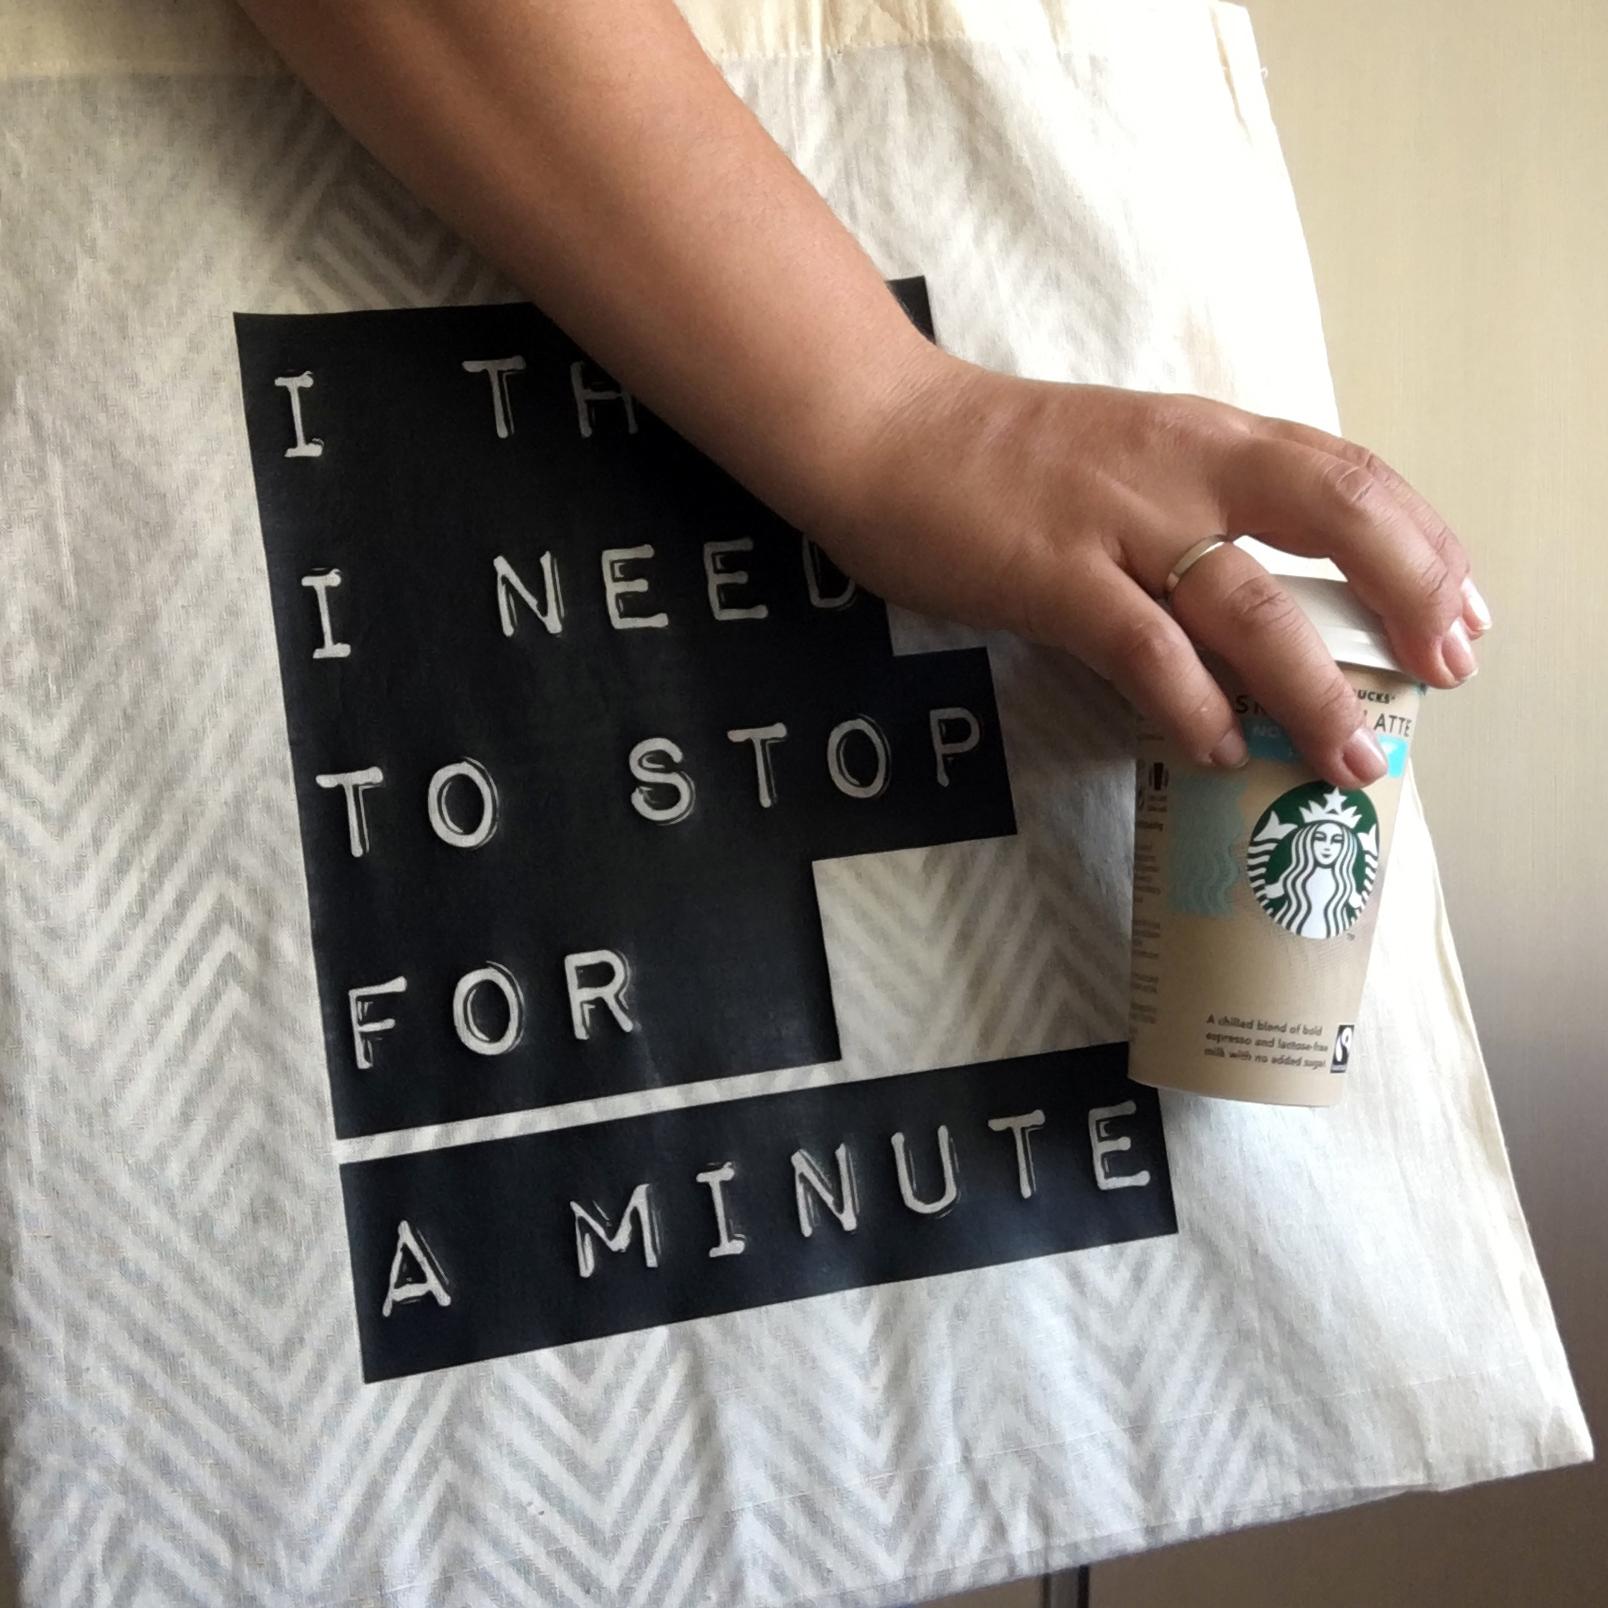 anaromao_senhorosorio_totebag_stop4aminute_and_coffee